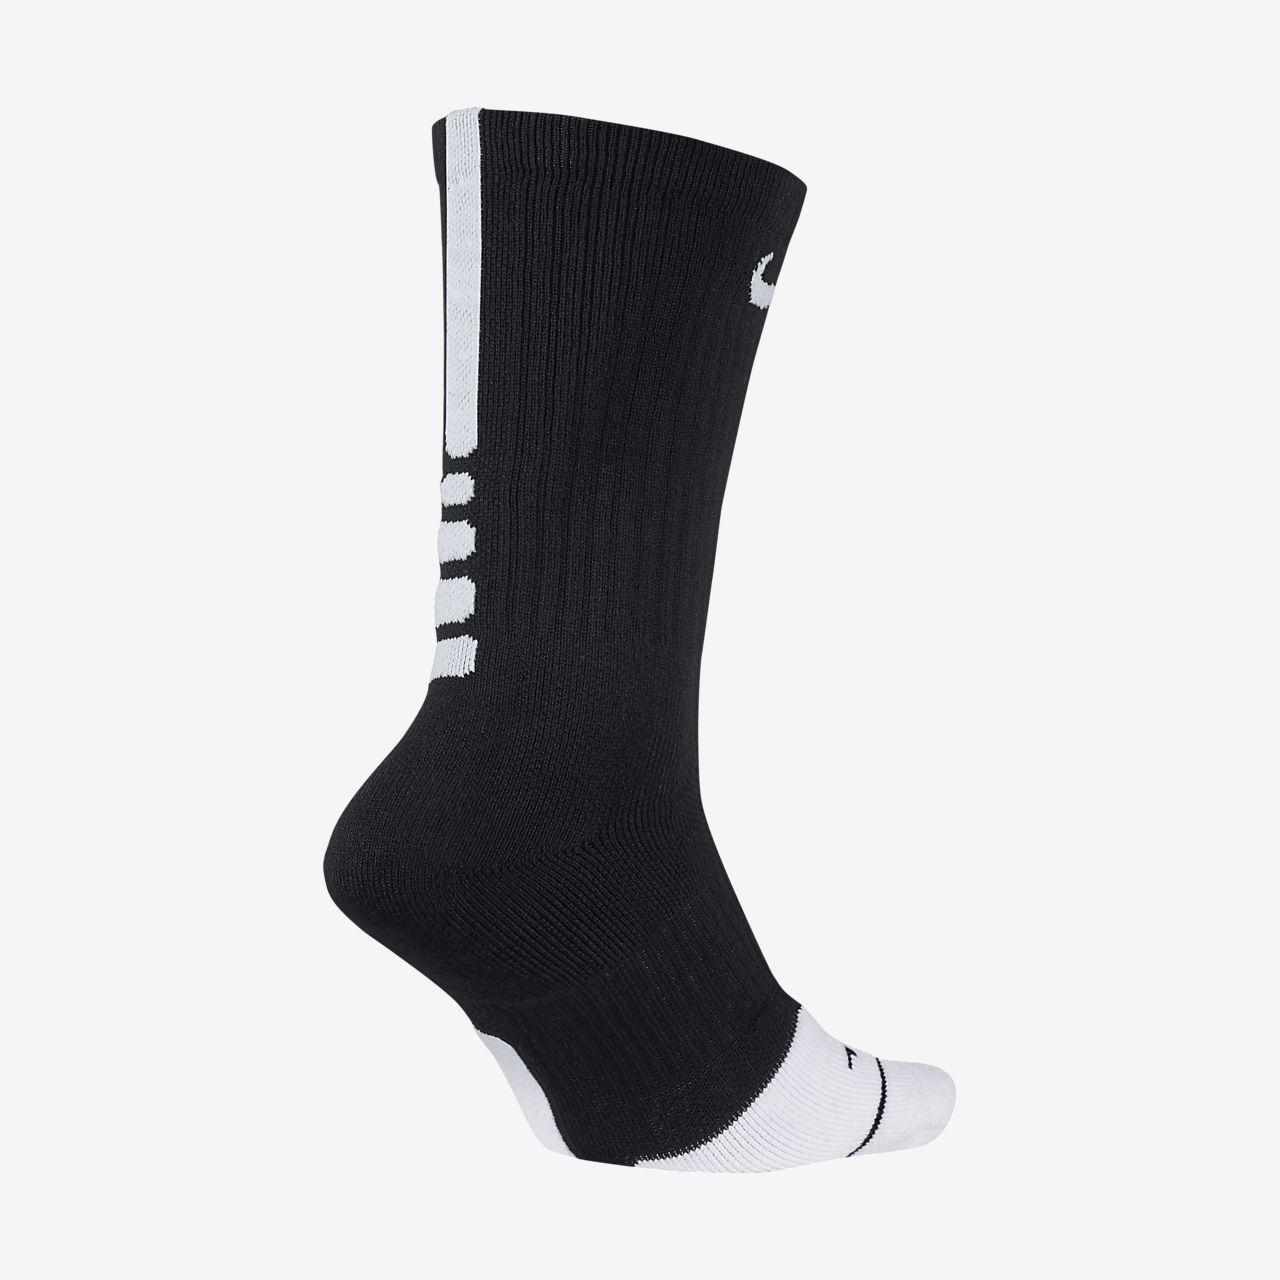 Chaussettes de basketball Nike Dry Elite 1.5 Crew